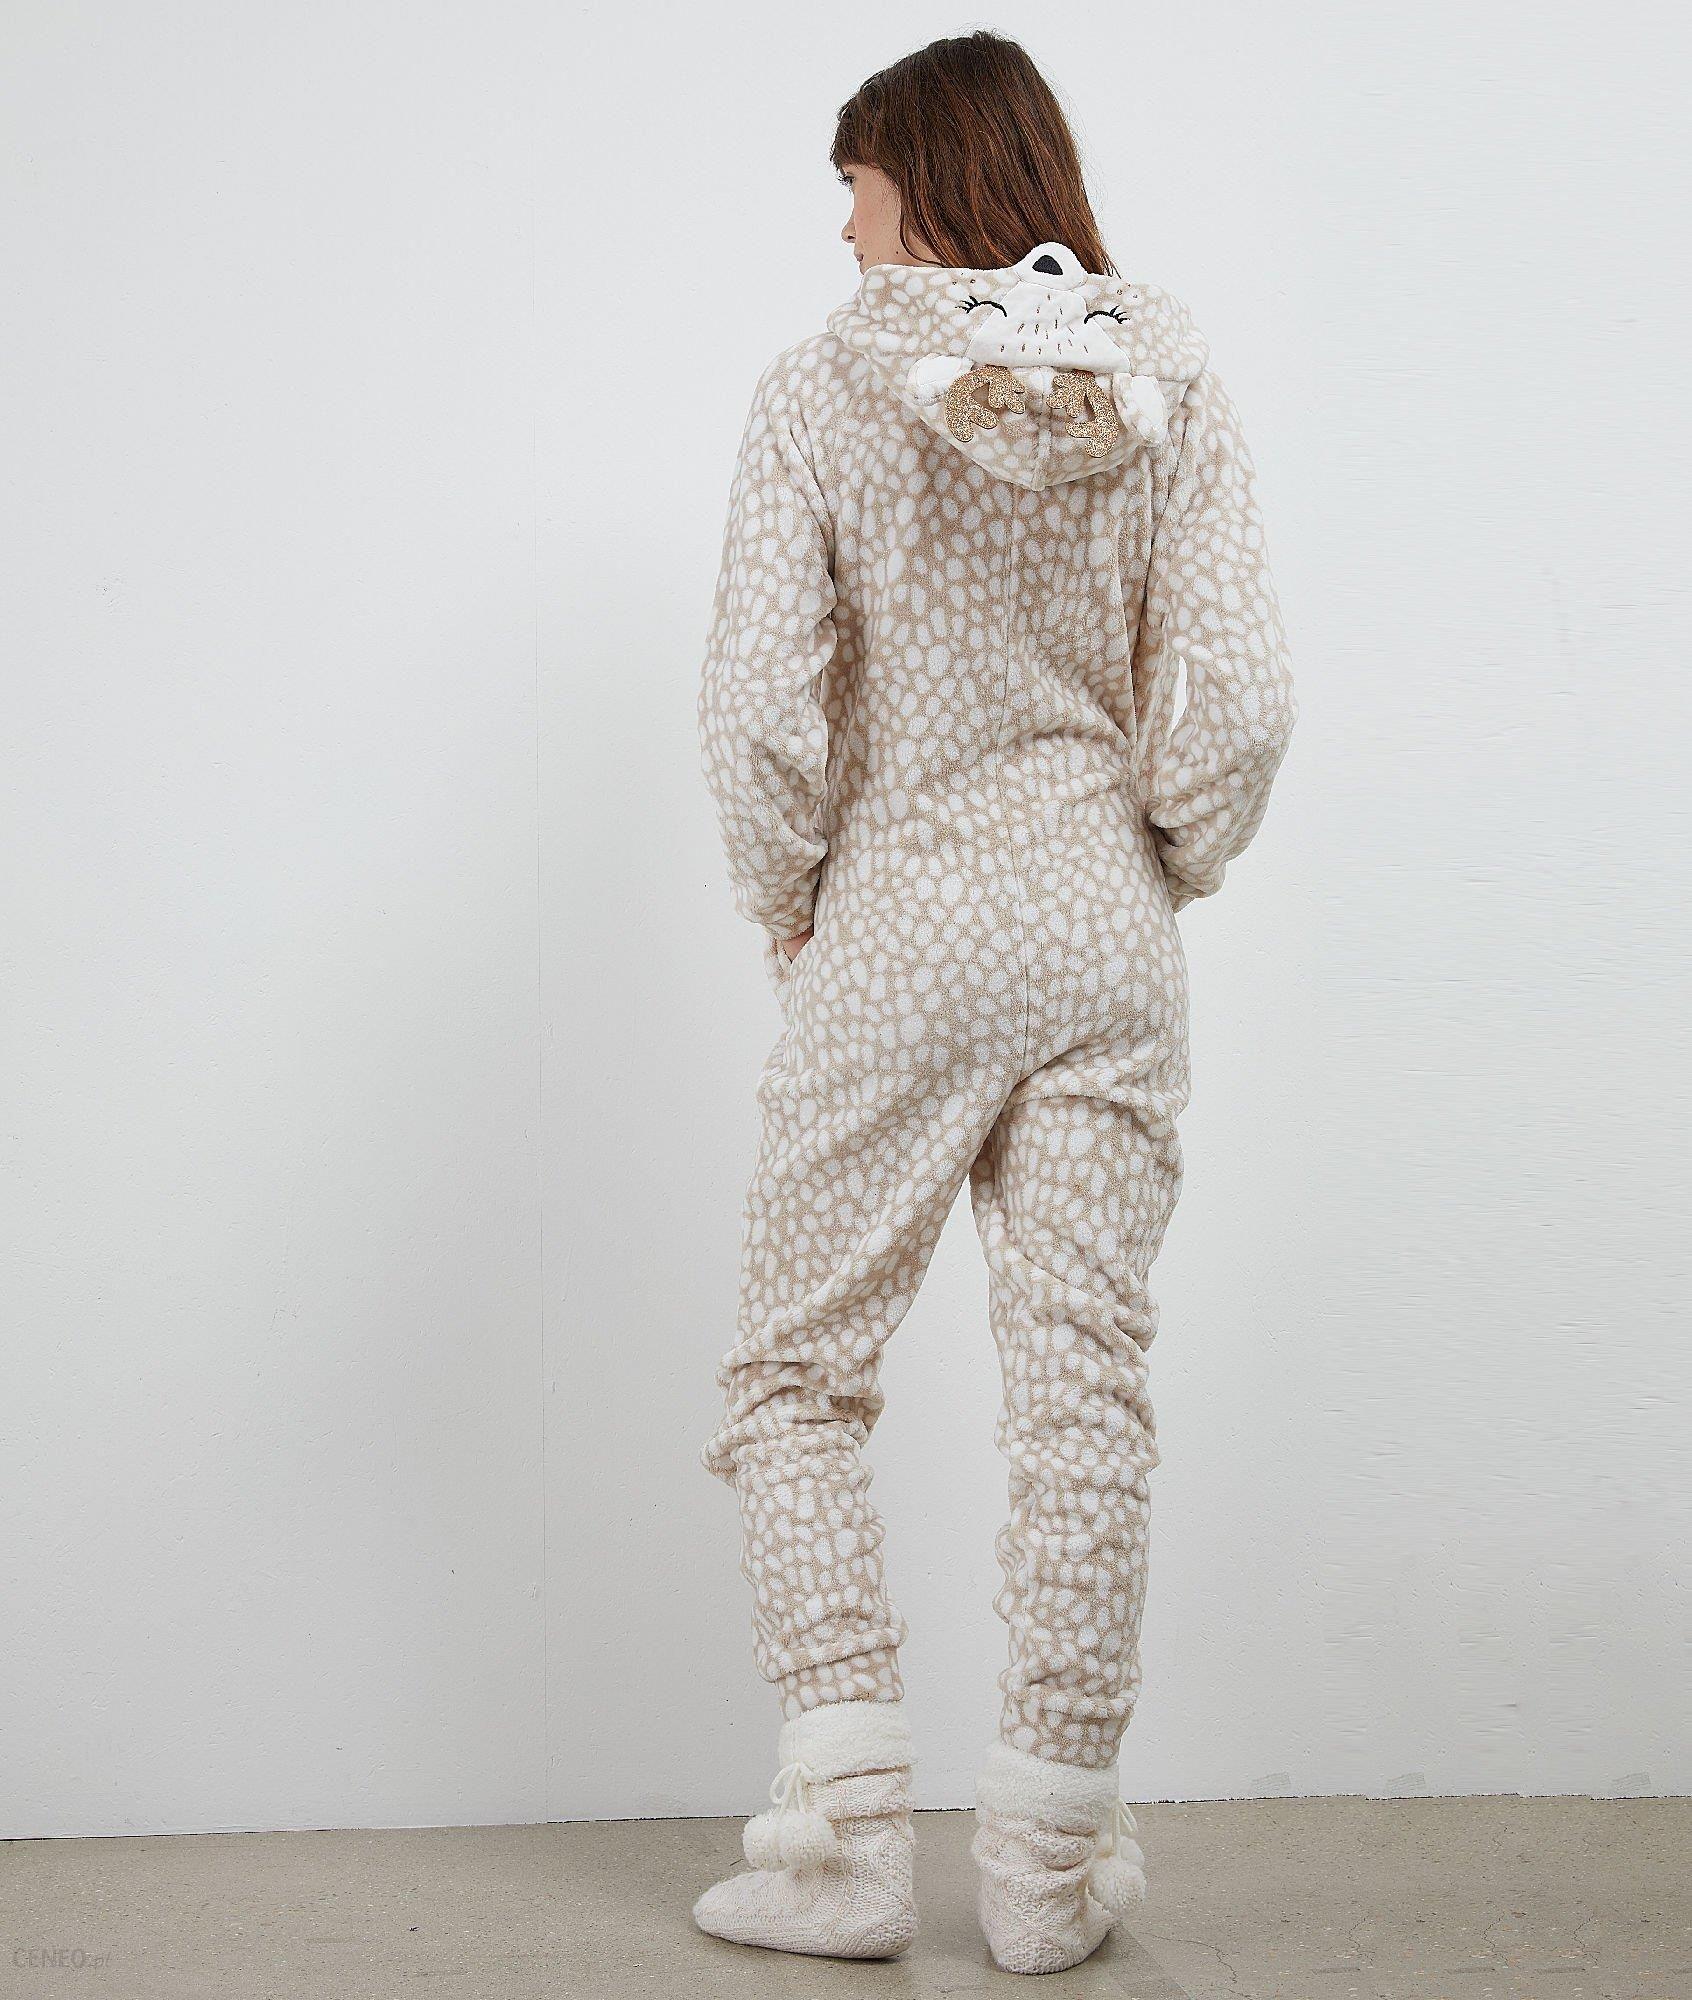 meilleur service 93fc5 c5117 Etam Combinaison pyjama girafe - MIGNONE - Ceny i opinie - Ceneo.pl